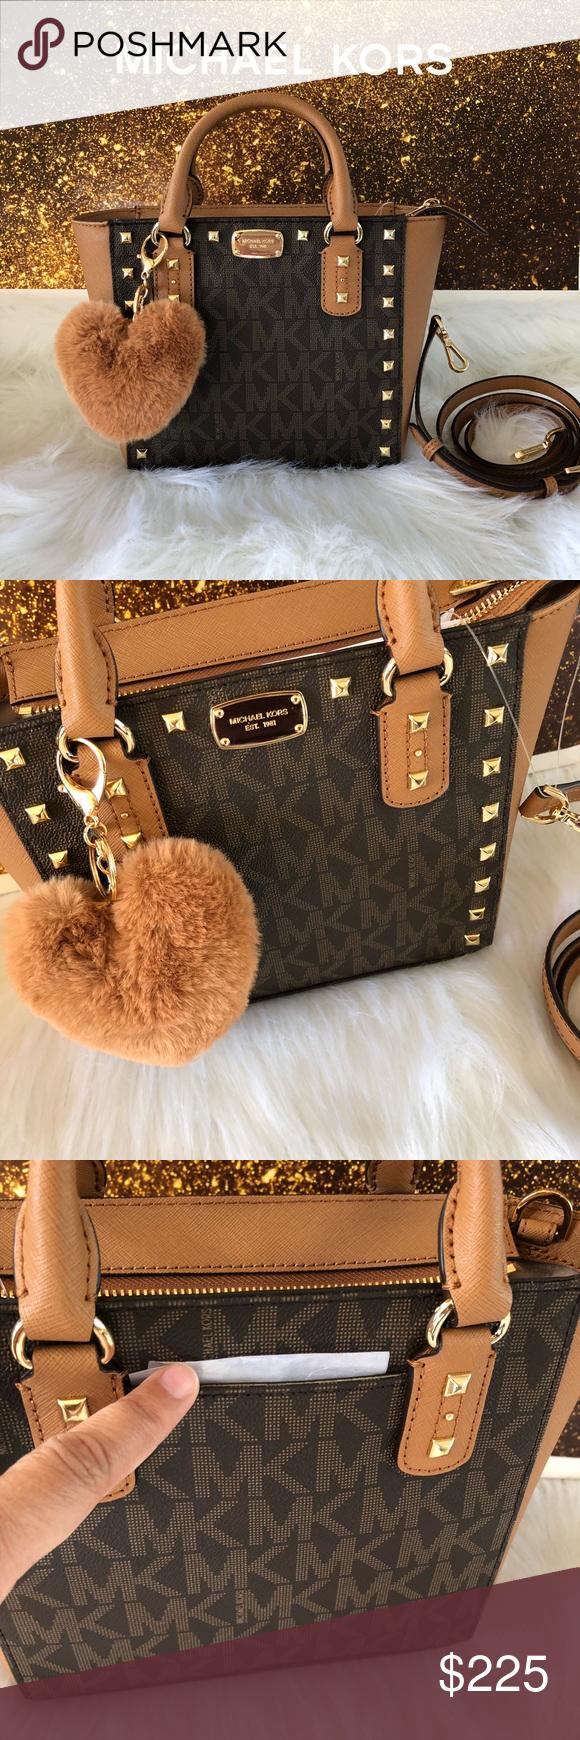 1fd7481900f2 Spotted while shopping on Poshmark  New Authentic MK Sandrine Stud crossbody  bag!  poshmark  fashion  shopping  style  Michael Kors  Handbags